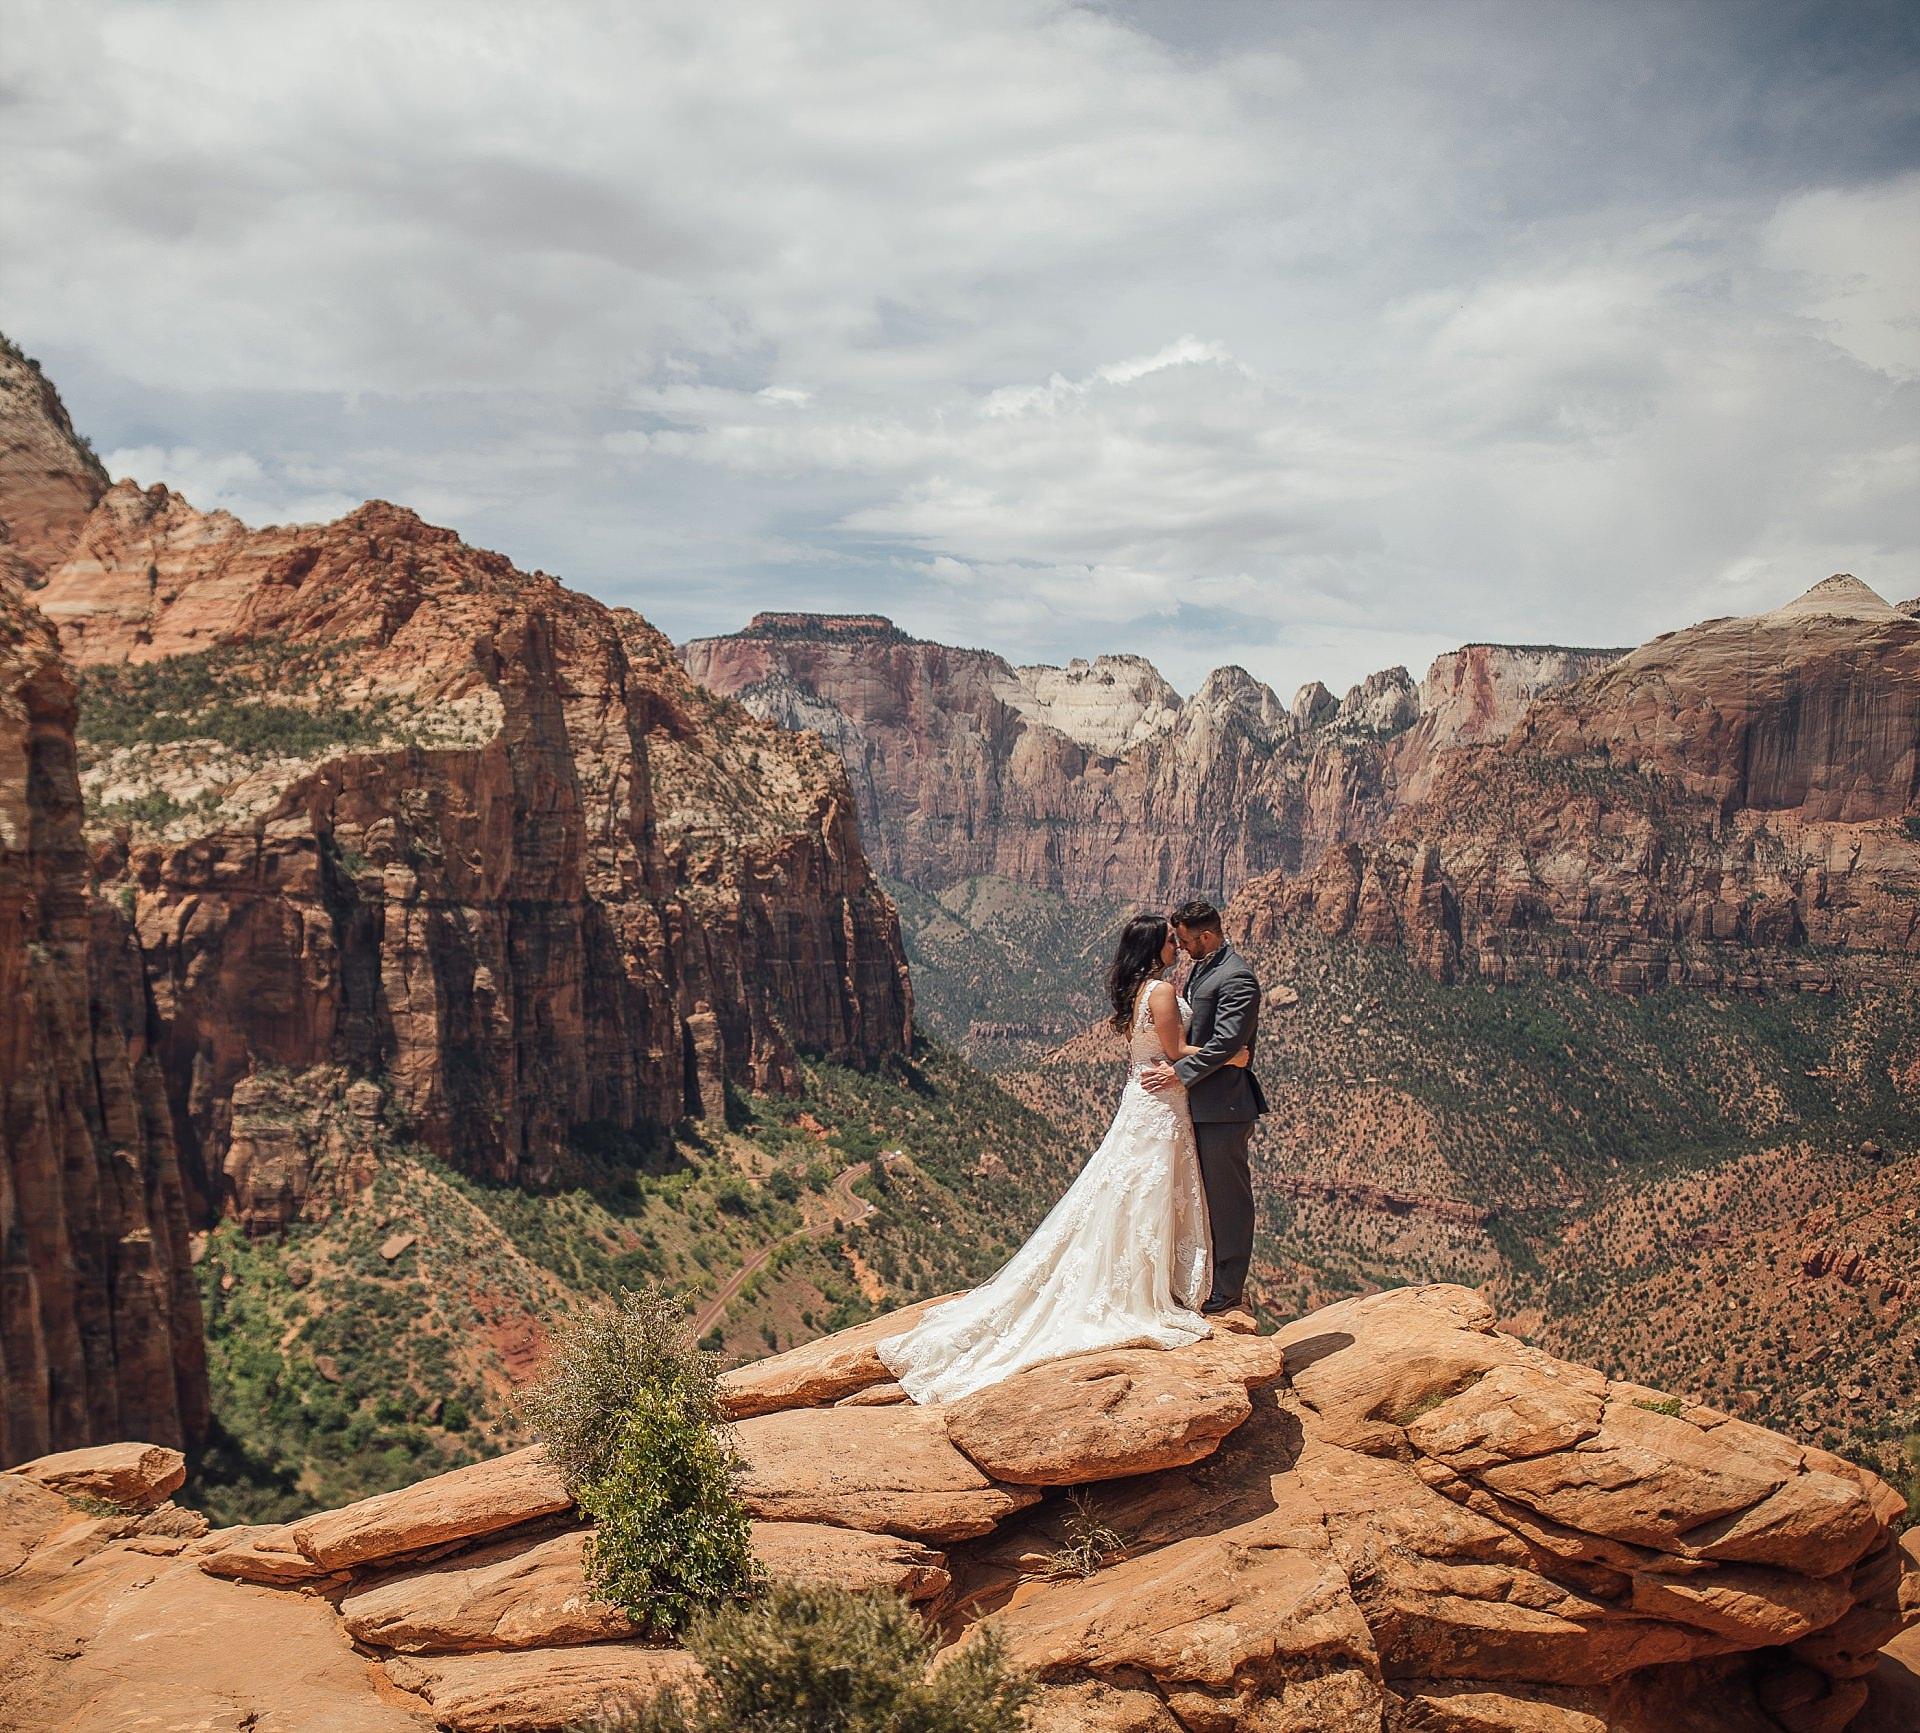 Hicks-Zion-National-Park-Wedding-0012.jpg